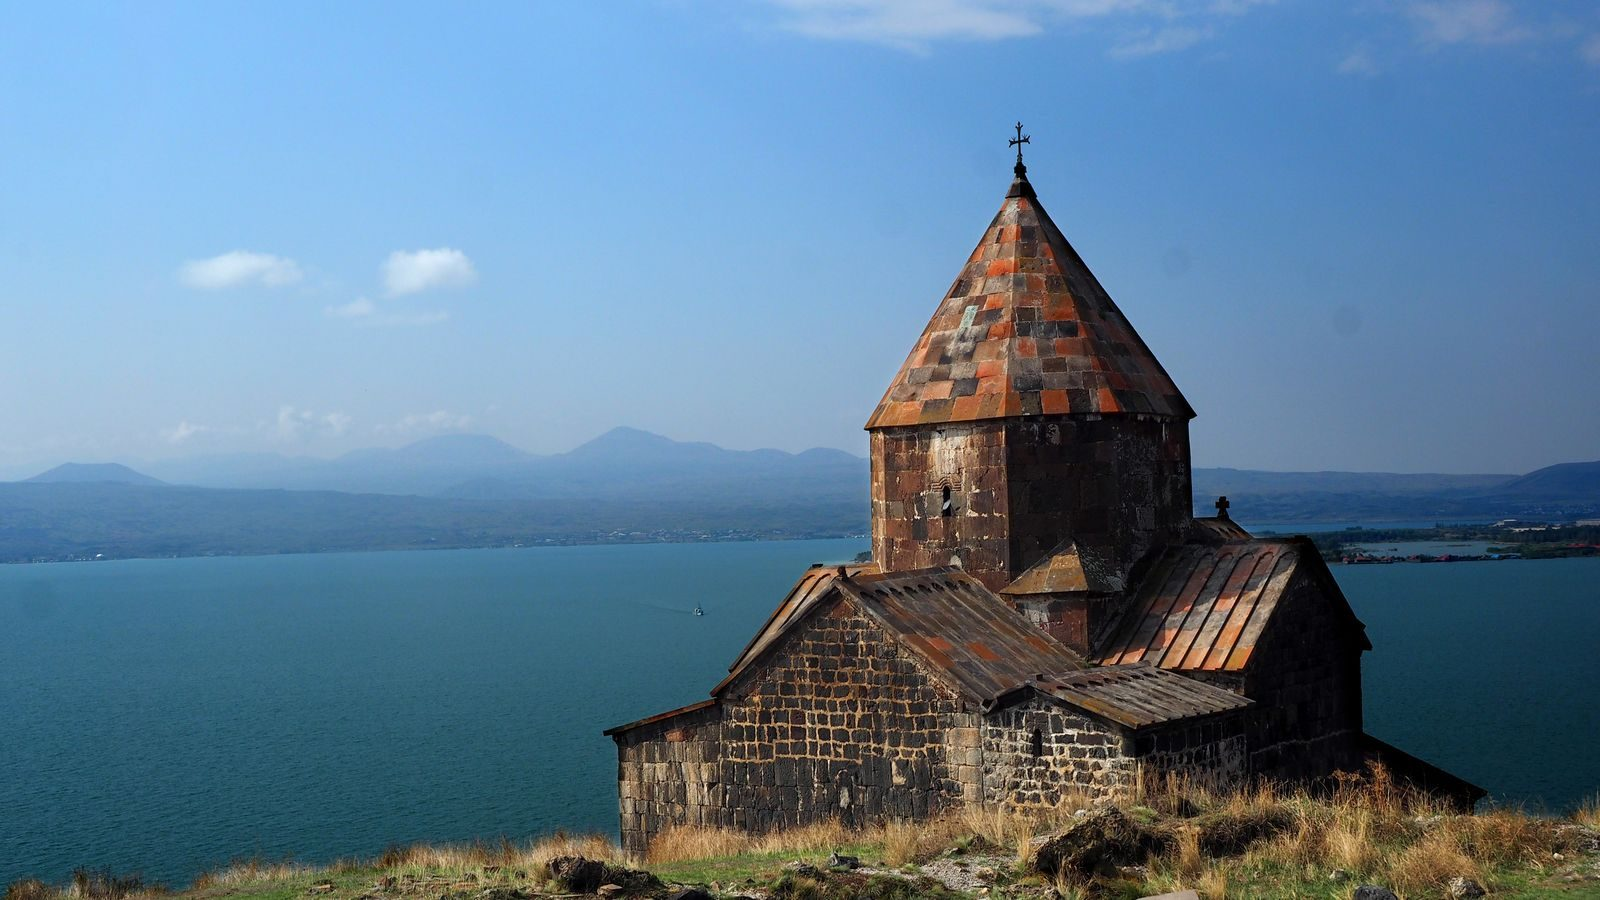 Radreise Armenien: Kloster Sewanawank